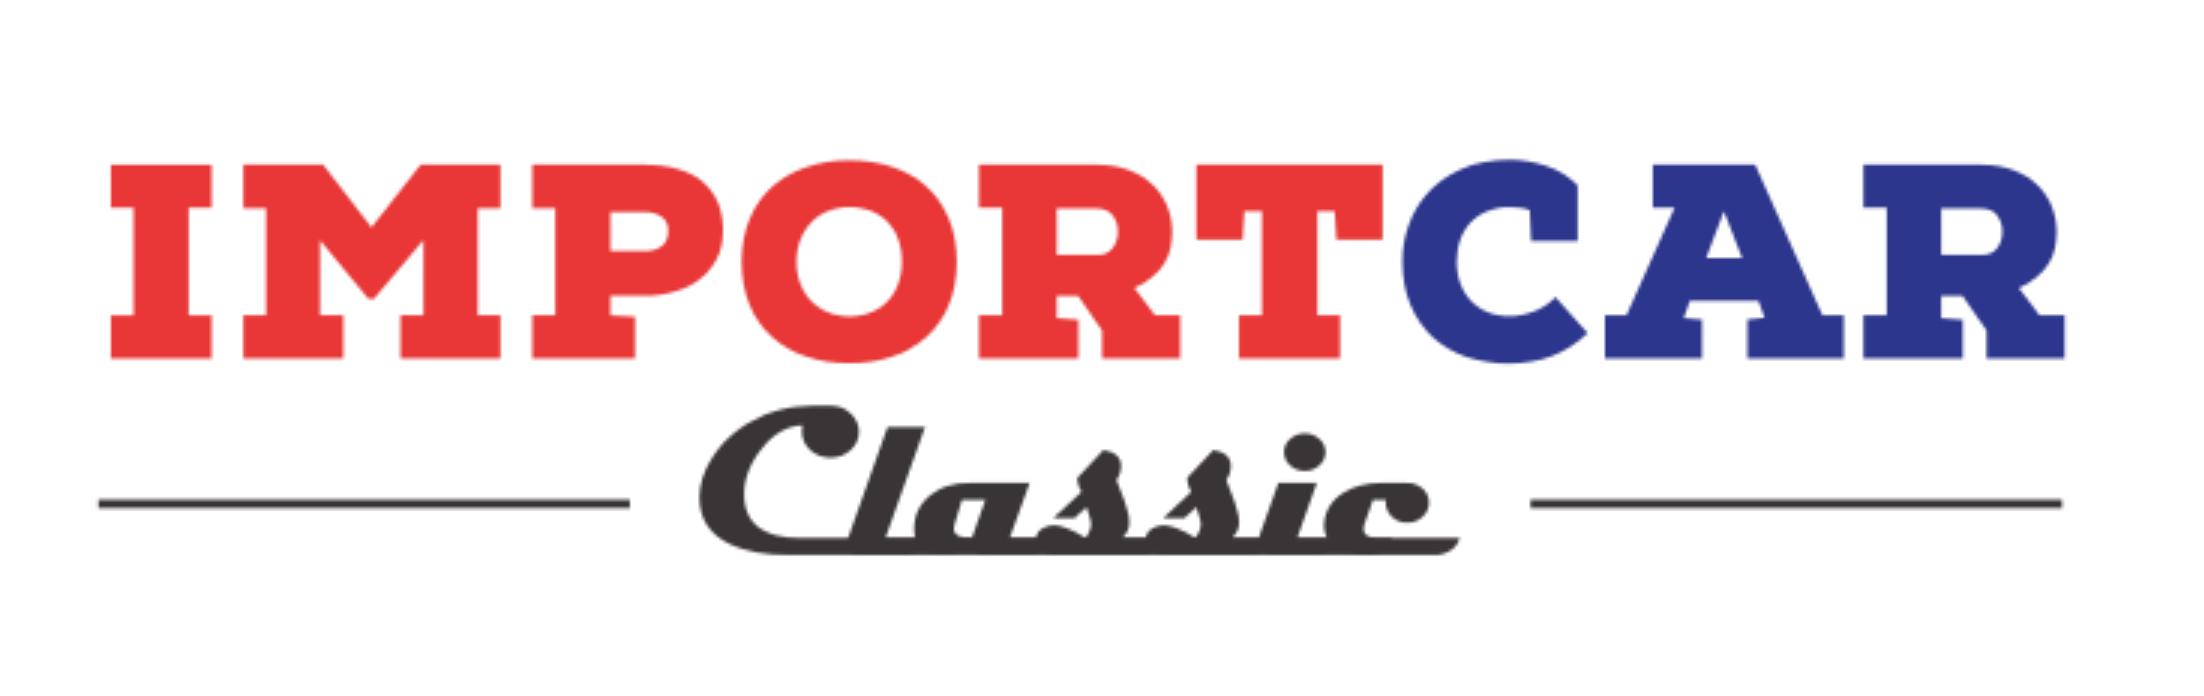 Image result for Import Car Group s.r.o. logo